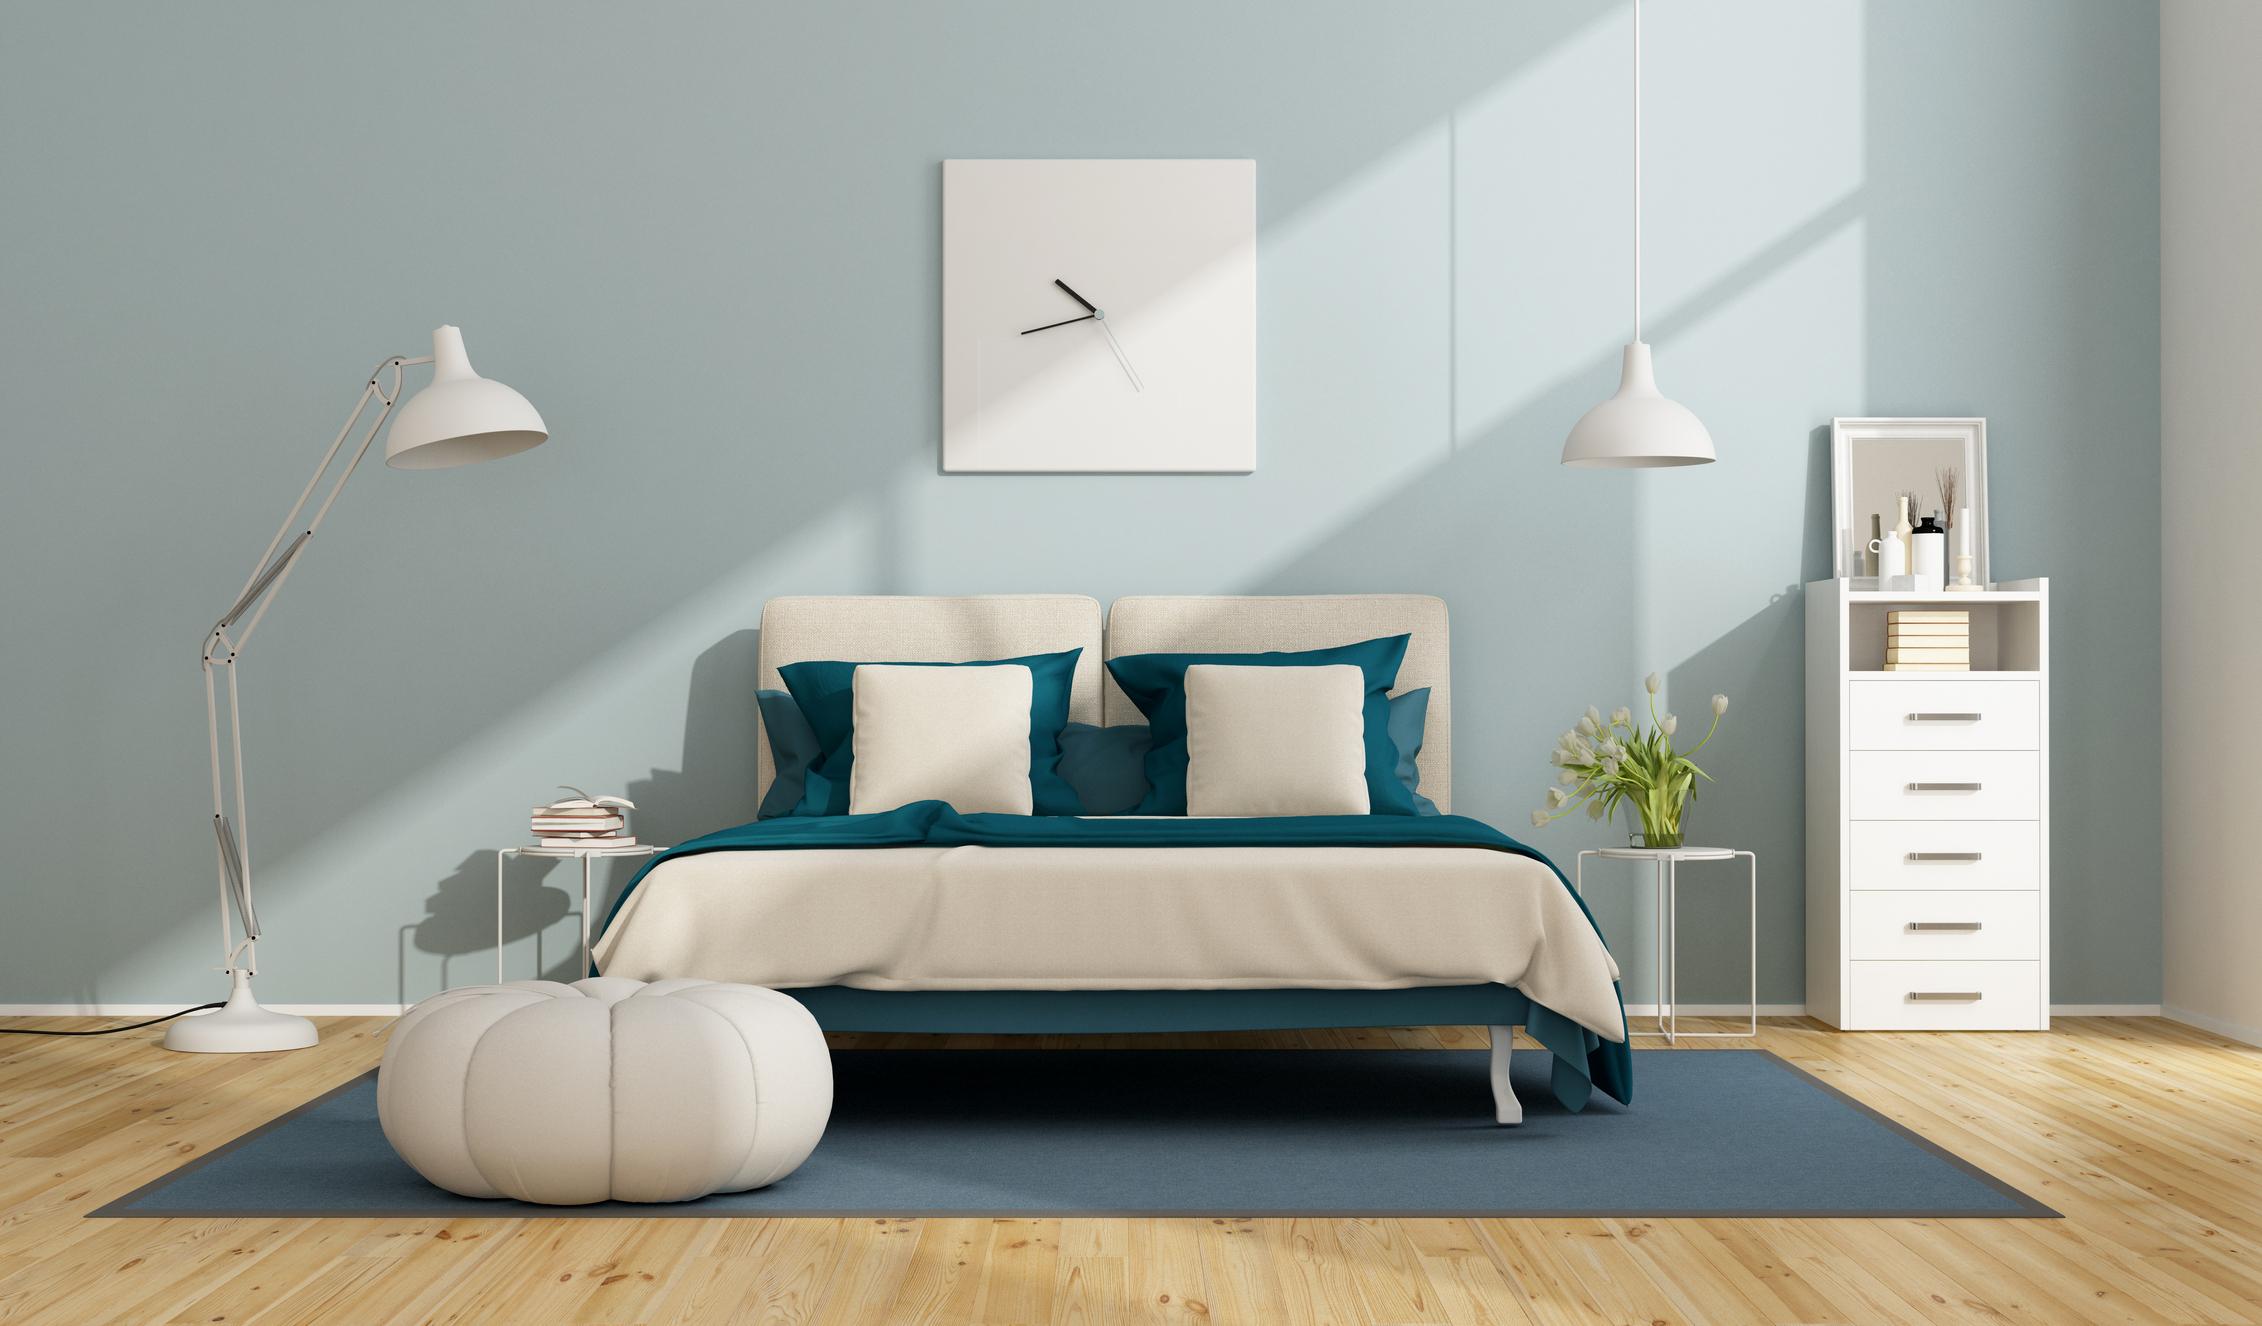 Serba Minimalis Ini 5 Inspirasi Lampu Hias Kamar Tidur